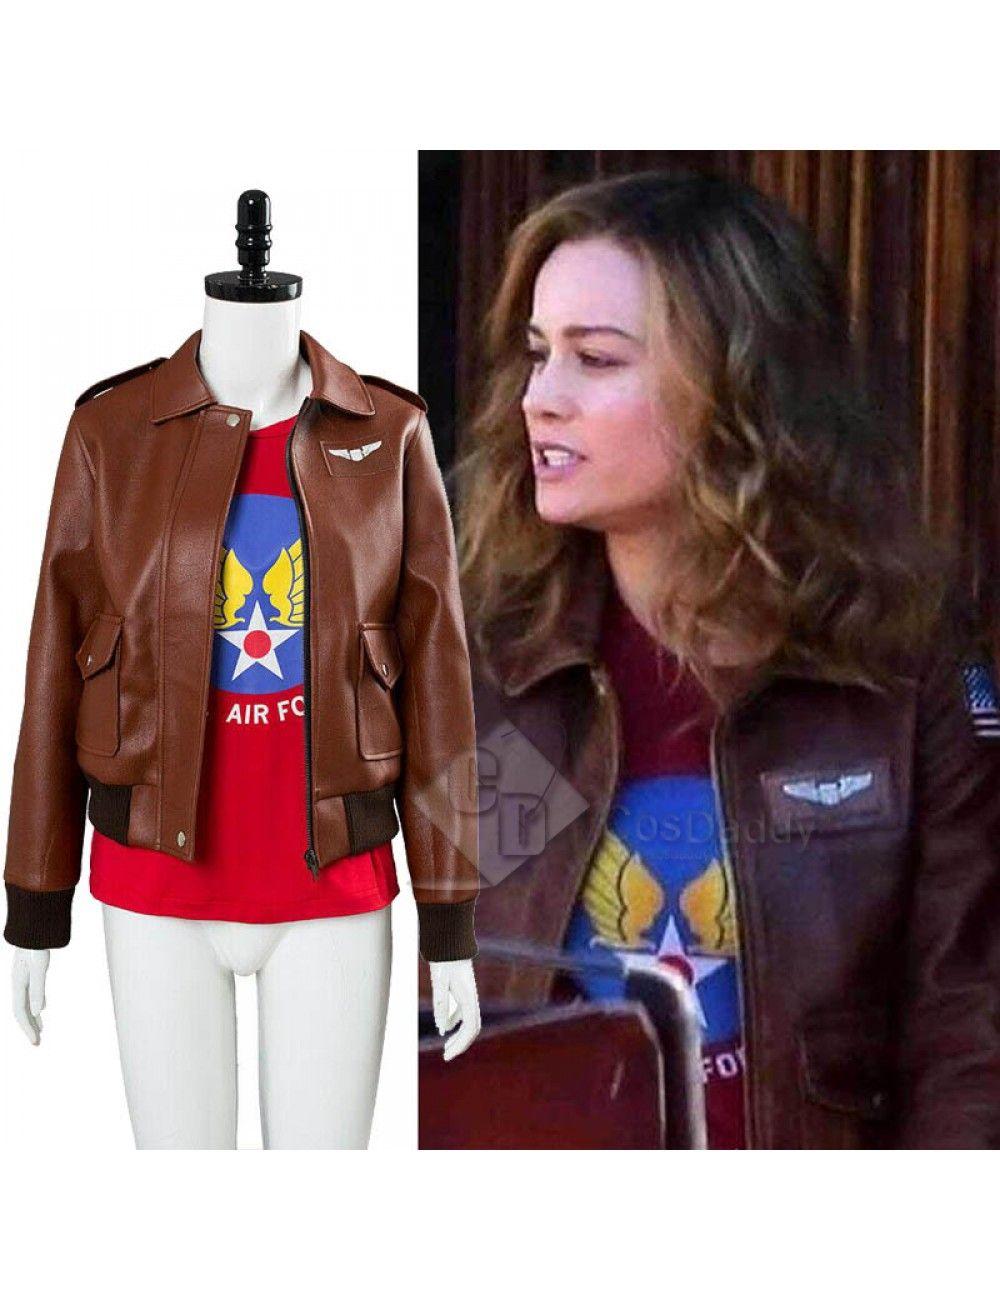 Captain Marvel Carol Danvers U S Air Force T Shirt Bomber Jacket Cosplay Costume Captain Marvel Costume Captain Marvel Carol Danvers Marvel Costumes [ 1300 x 1000 Pixel ]